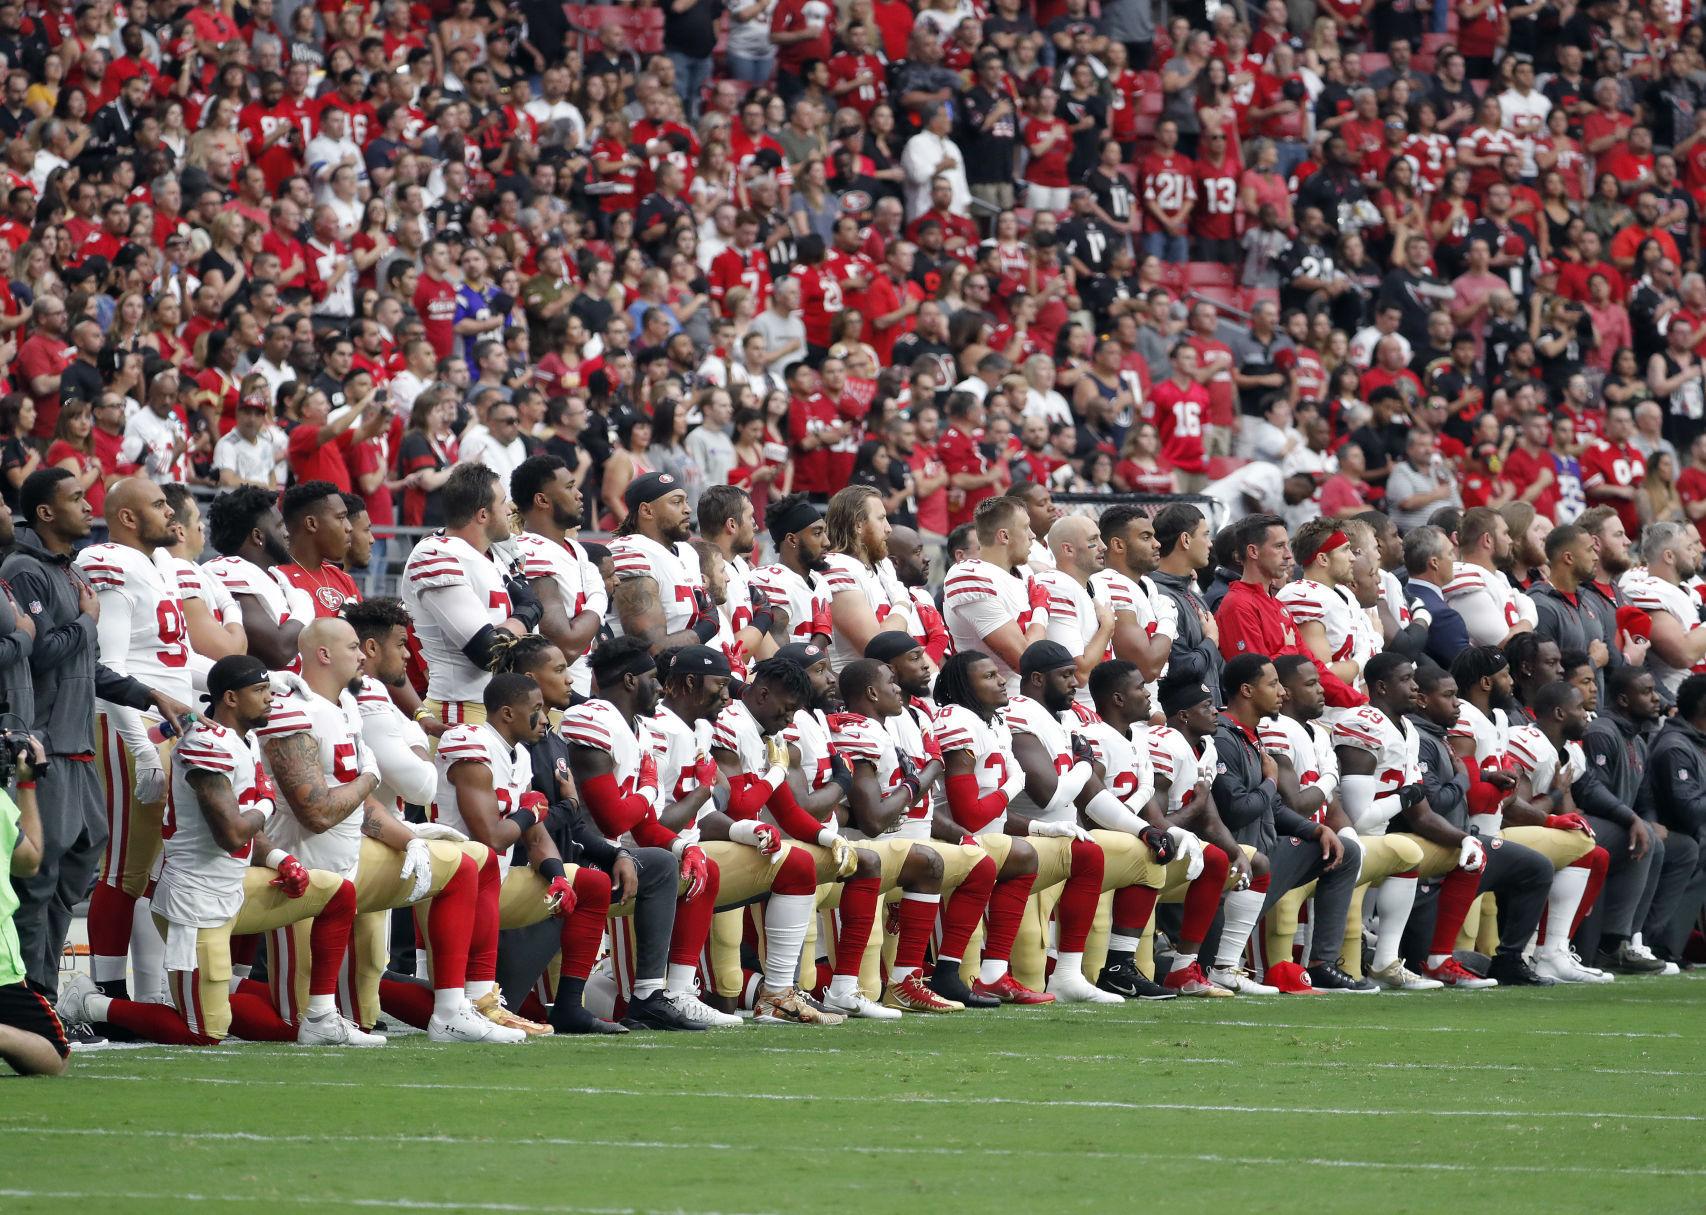 San Francisco 49ers players kneel during national anthem